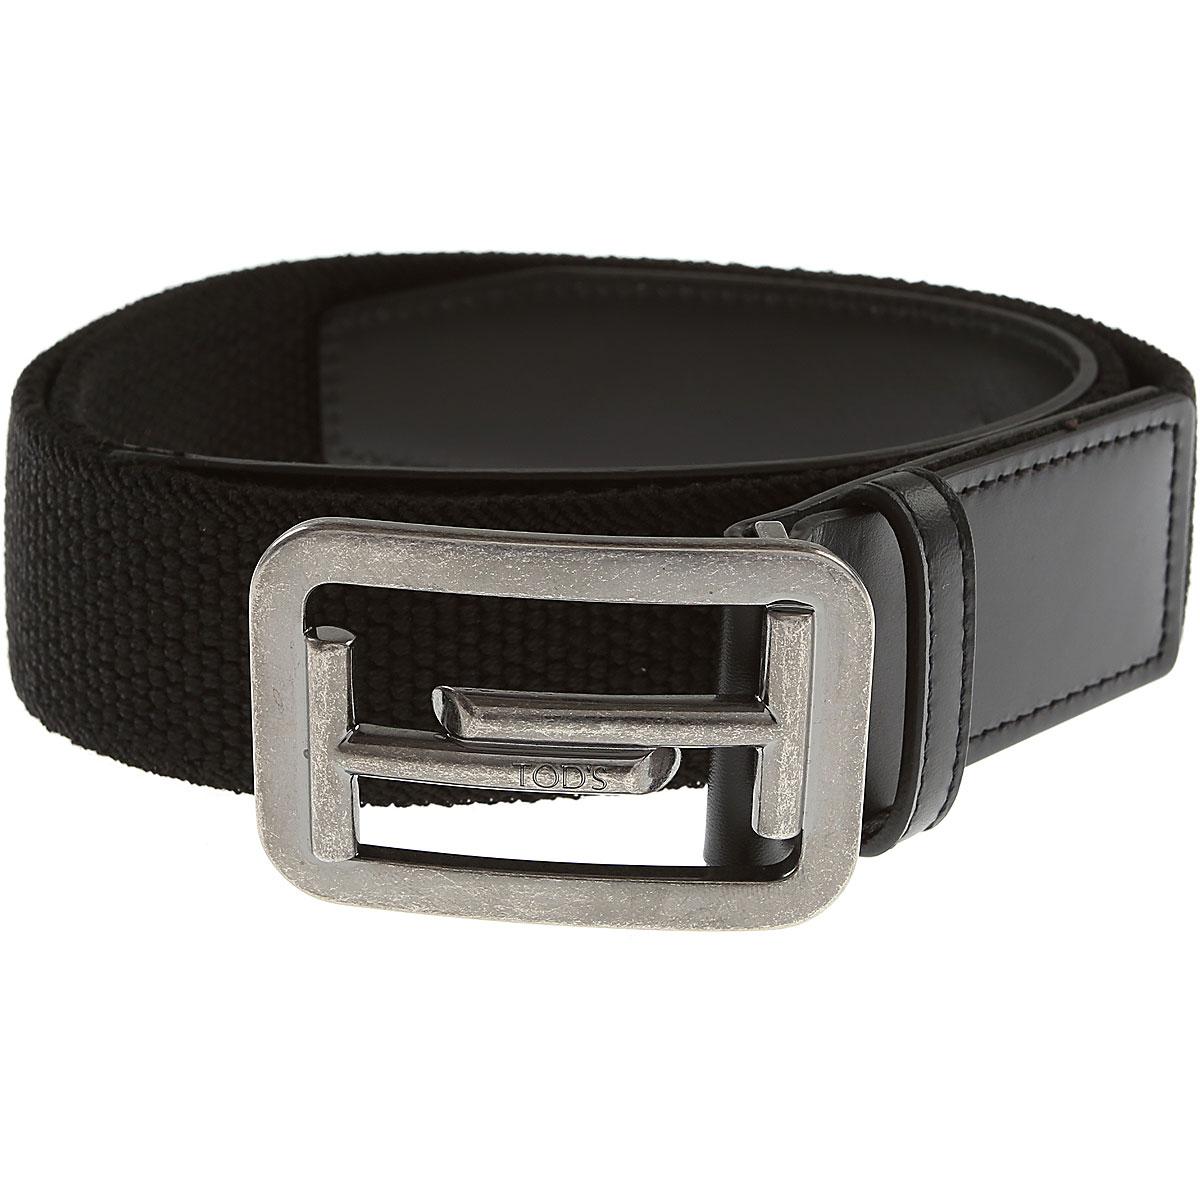 Tods Mens Belts, Black, Leather, 2017, 34 36 38 40 42 44